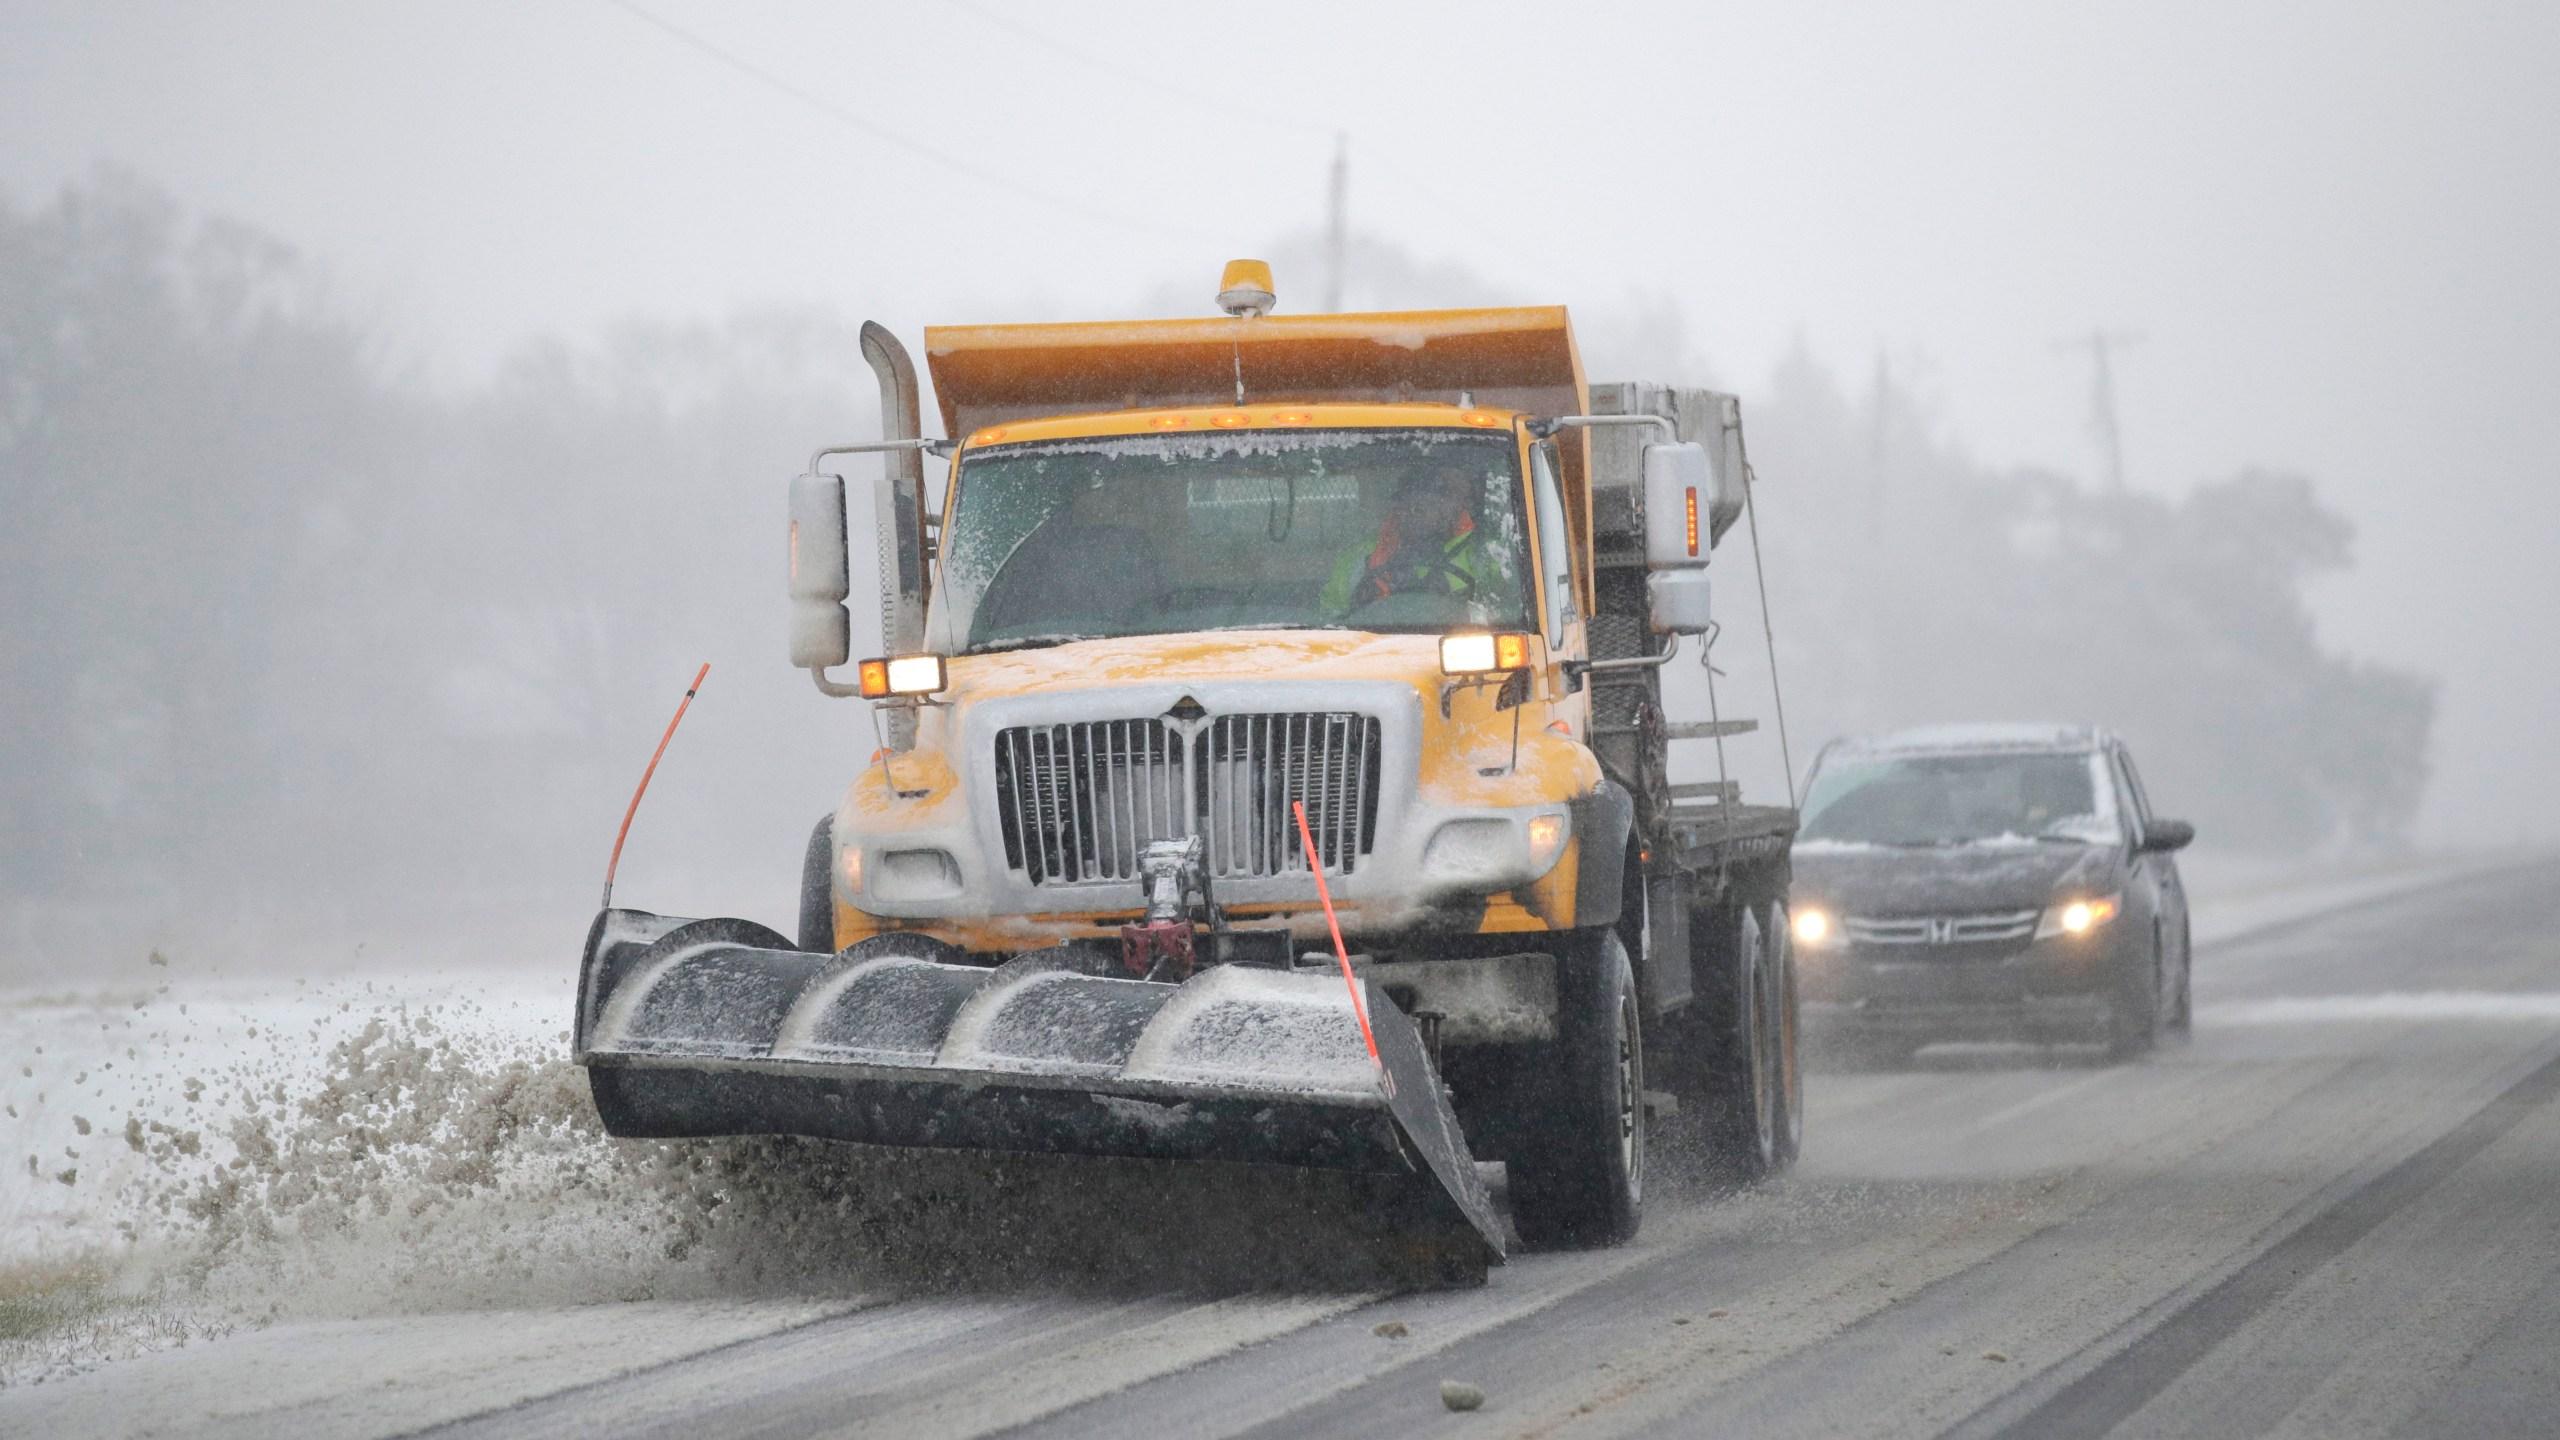 Midwest_Snowstorm_40629-159532.jpg84084409